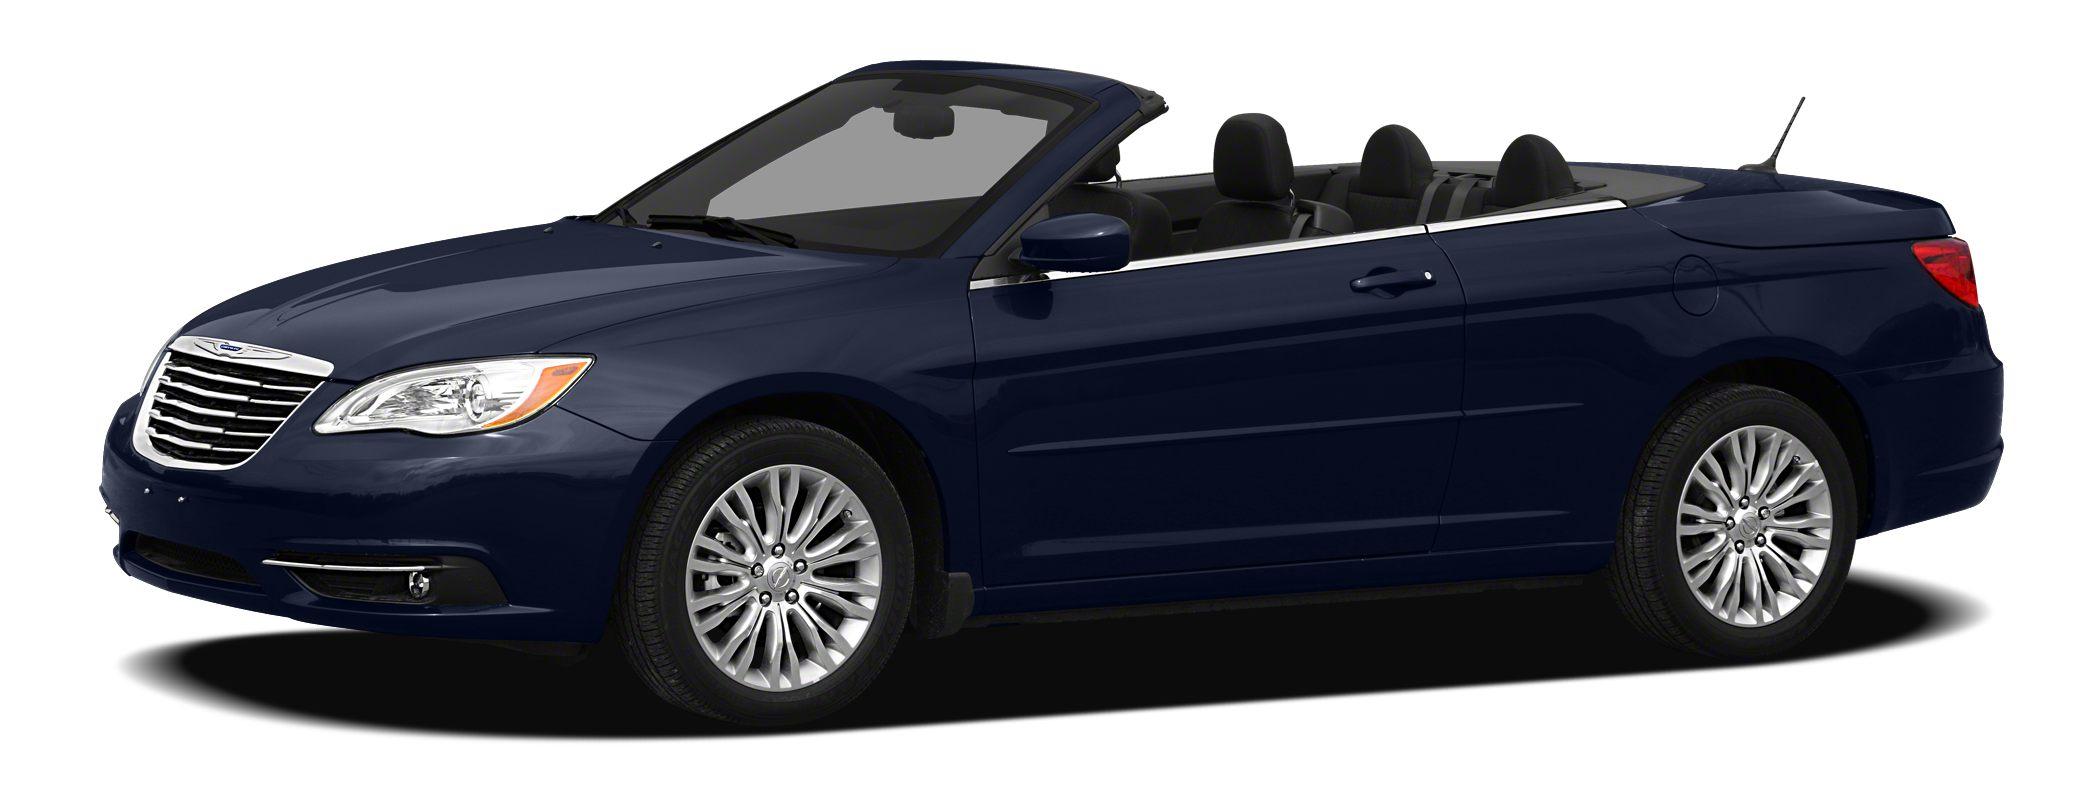 2011 Chrysler 200 Touring Touring trim EPA 29 MPG Hwy18 MPG City Satellite Radio iPodMP3 Inpu